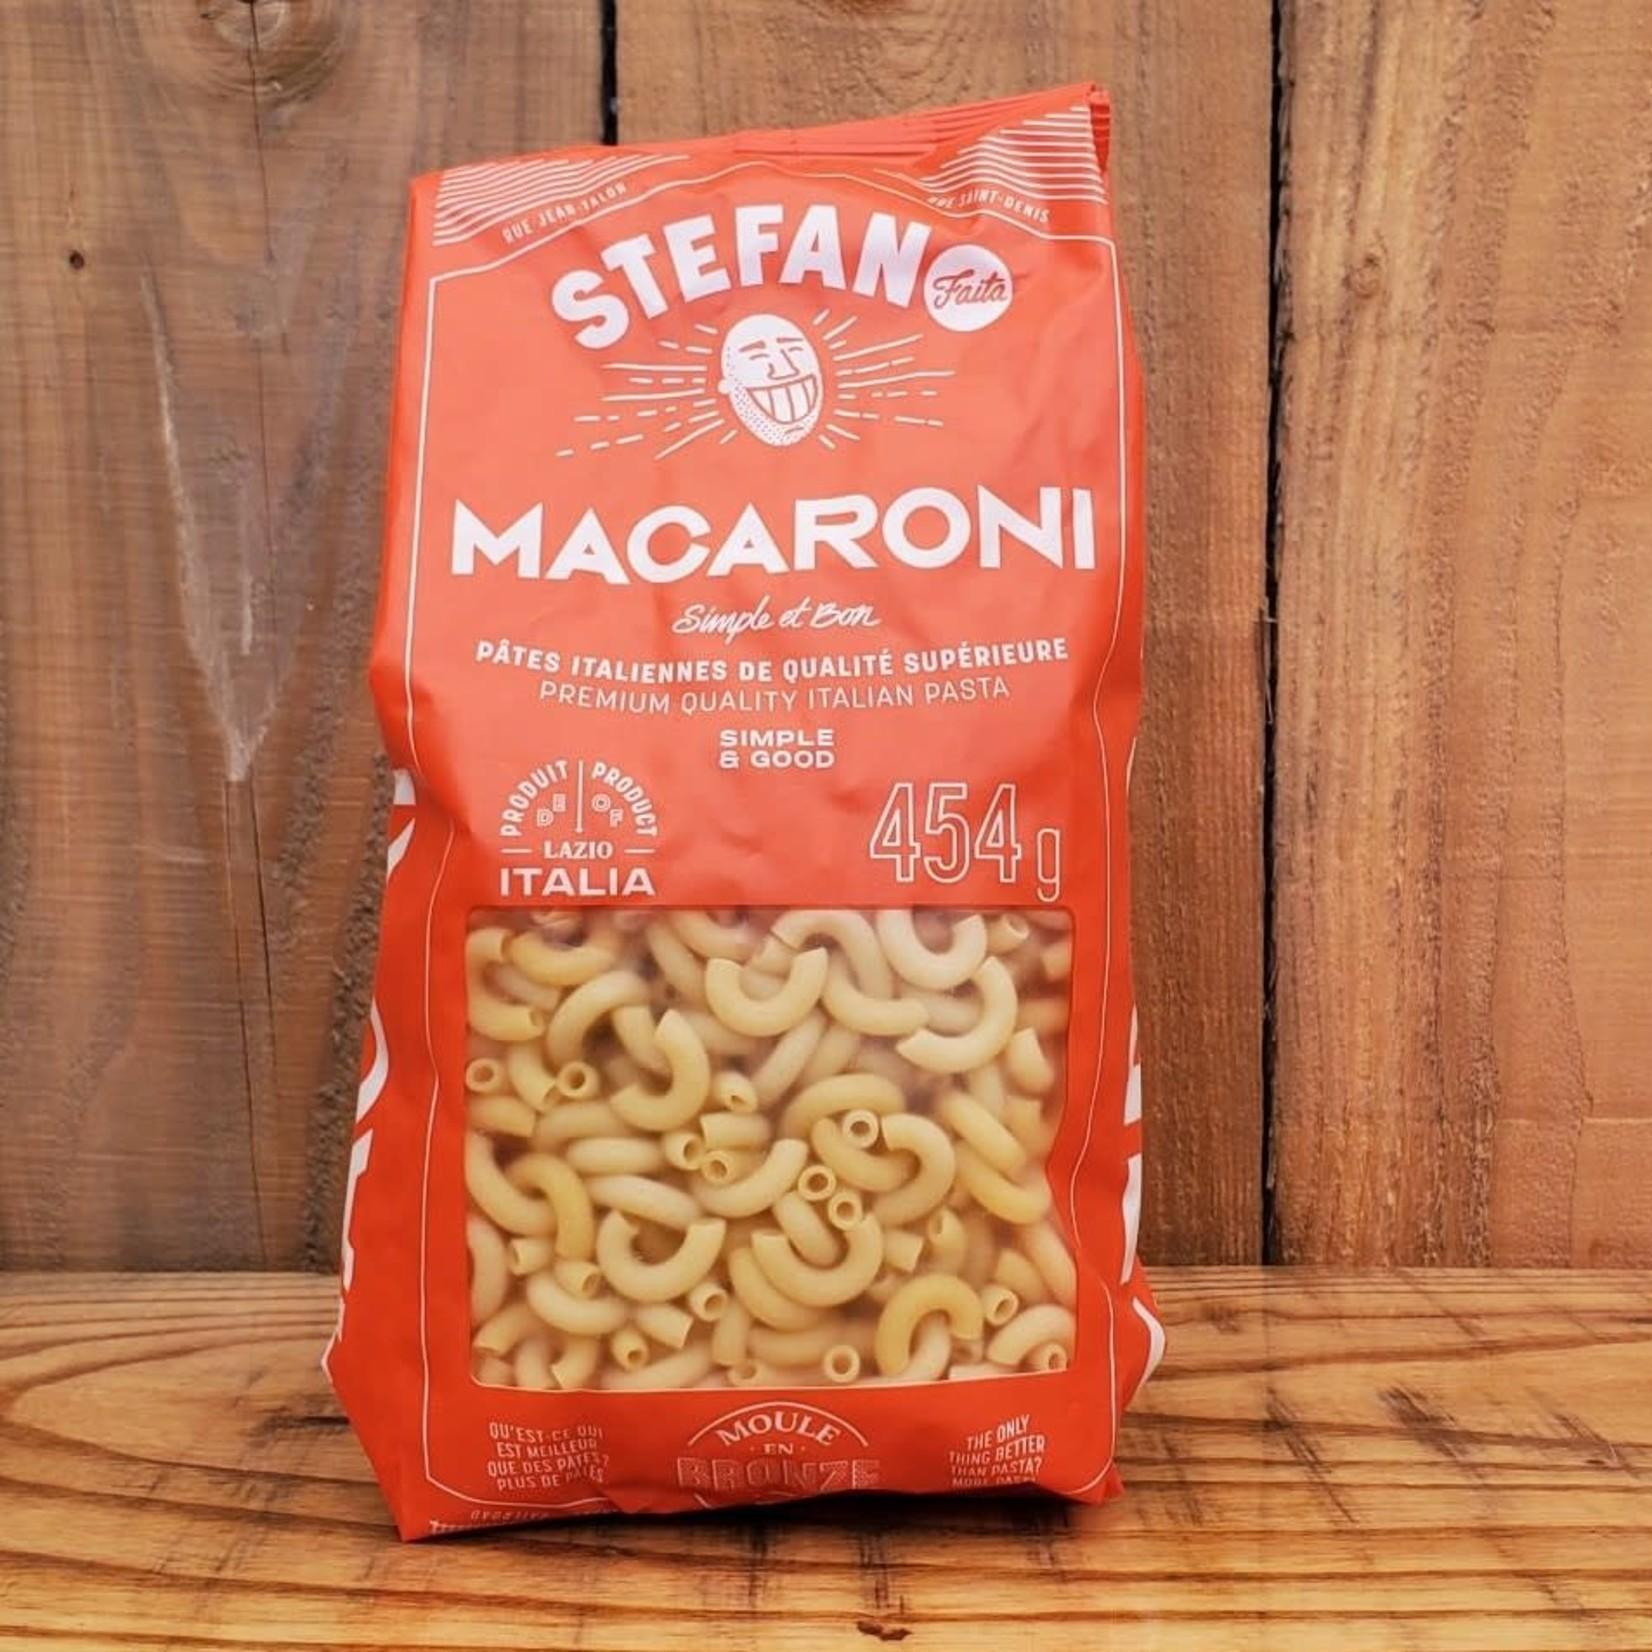 Stefano Stefano - Pâtes Macaroni (454g)